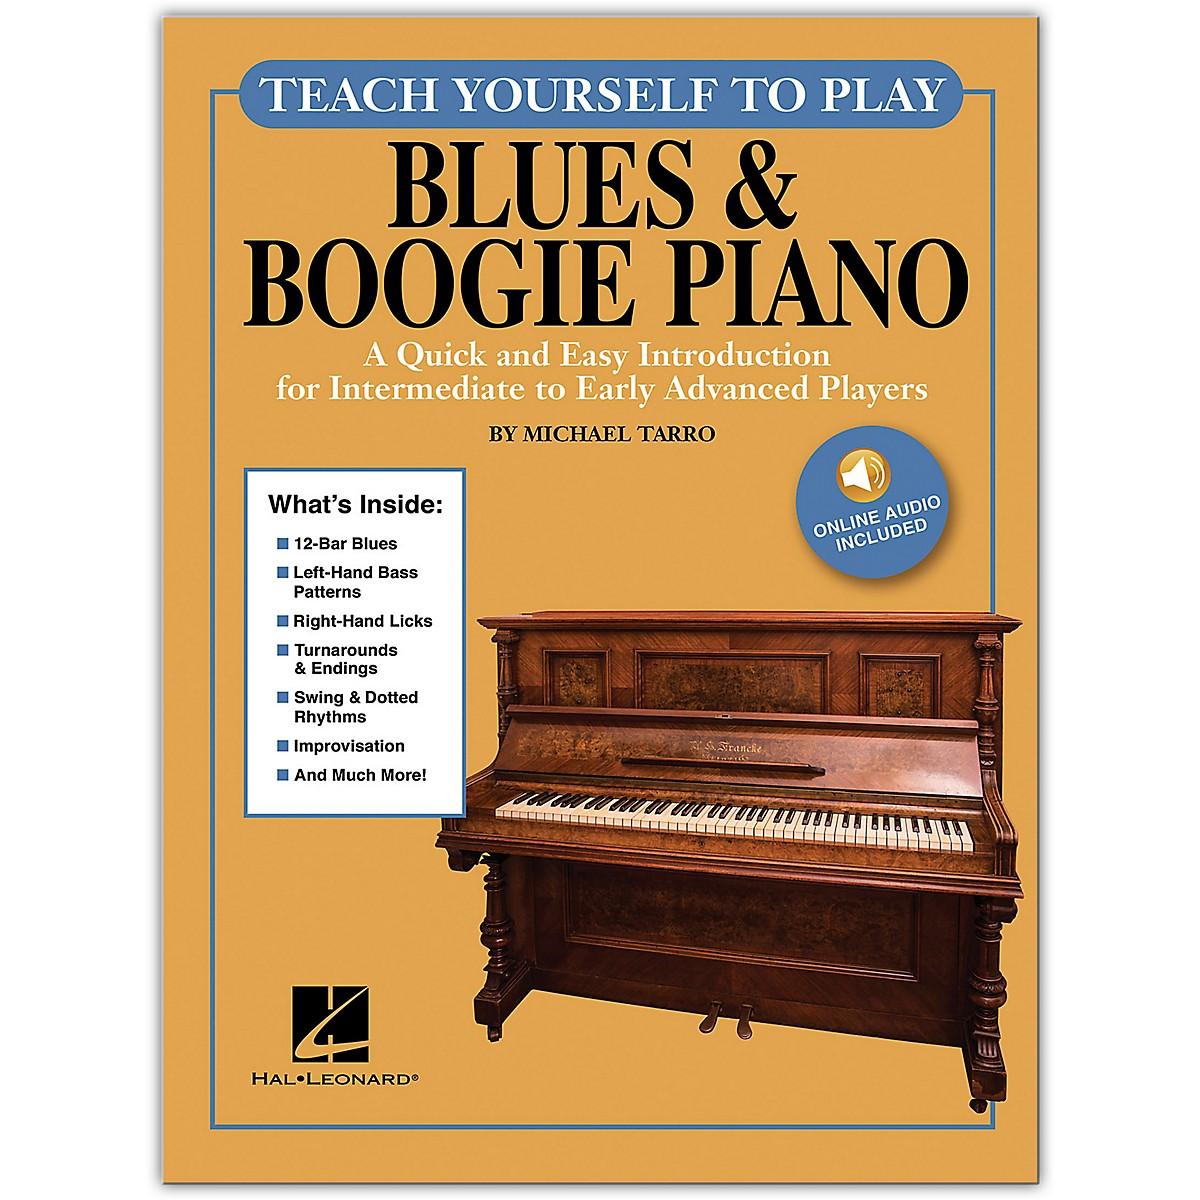 Hal Leonard Teach Yourself to Play Blues & Boogie Piano Written by Michael Tarro